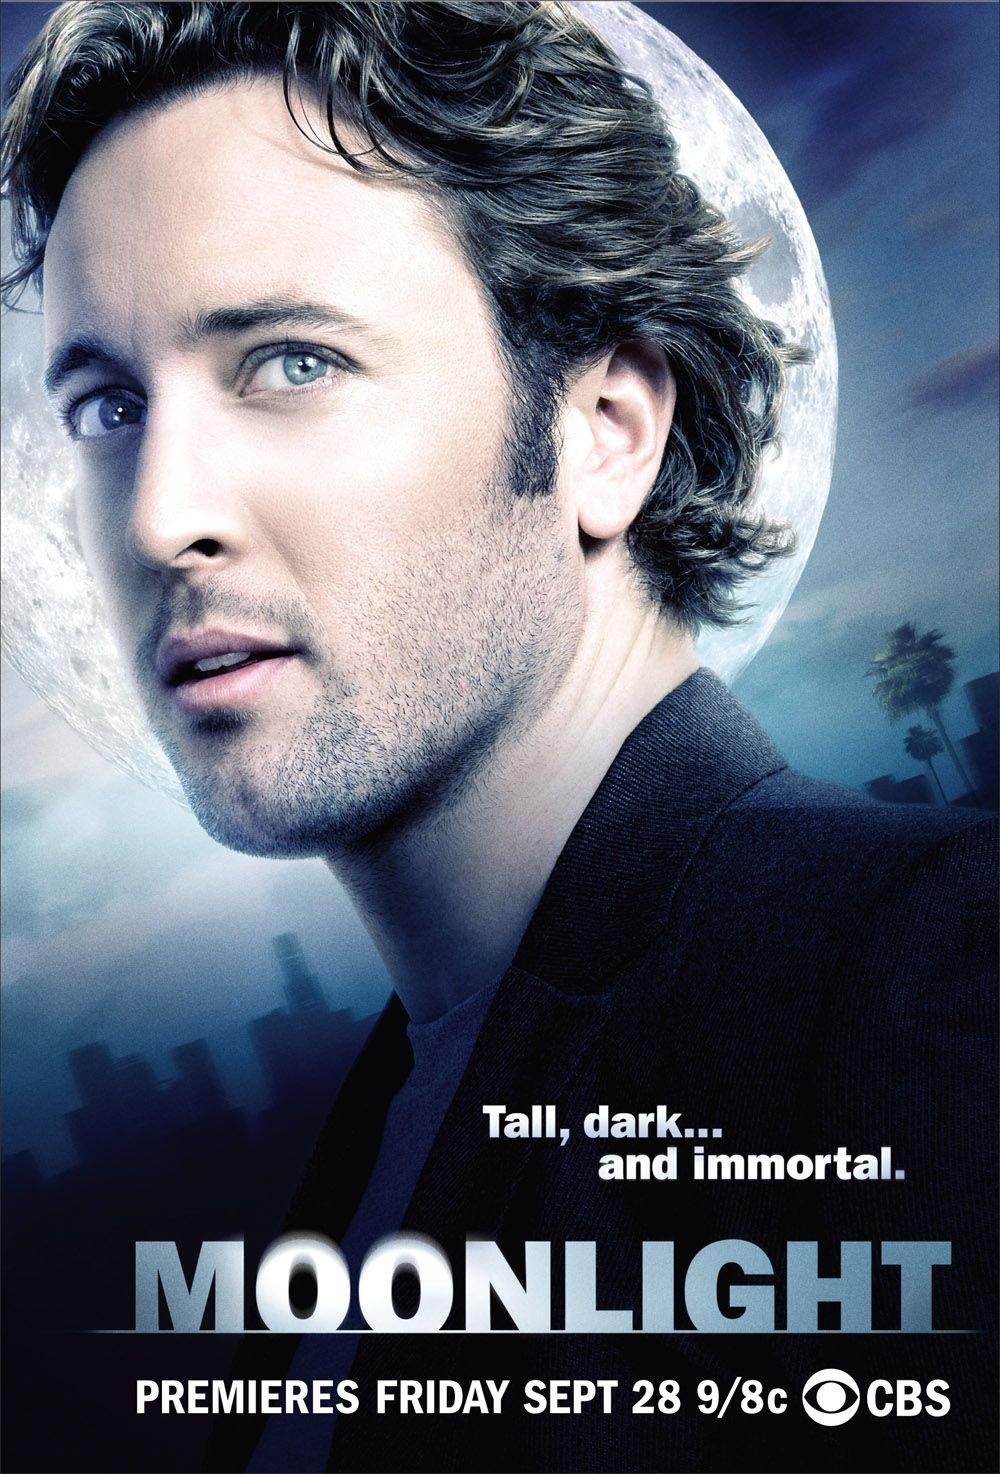 Moonlight 2007 poster for Moonlight serie